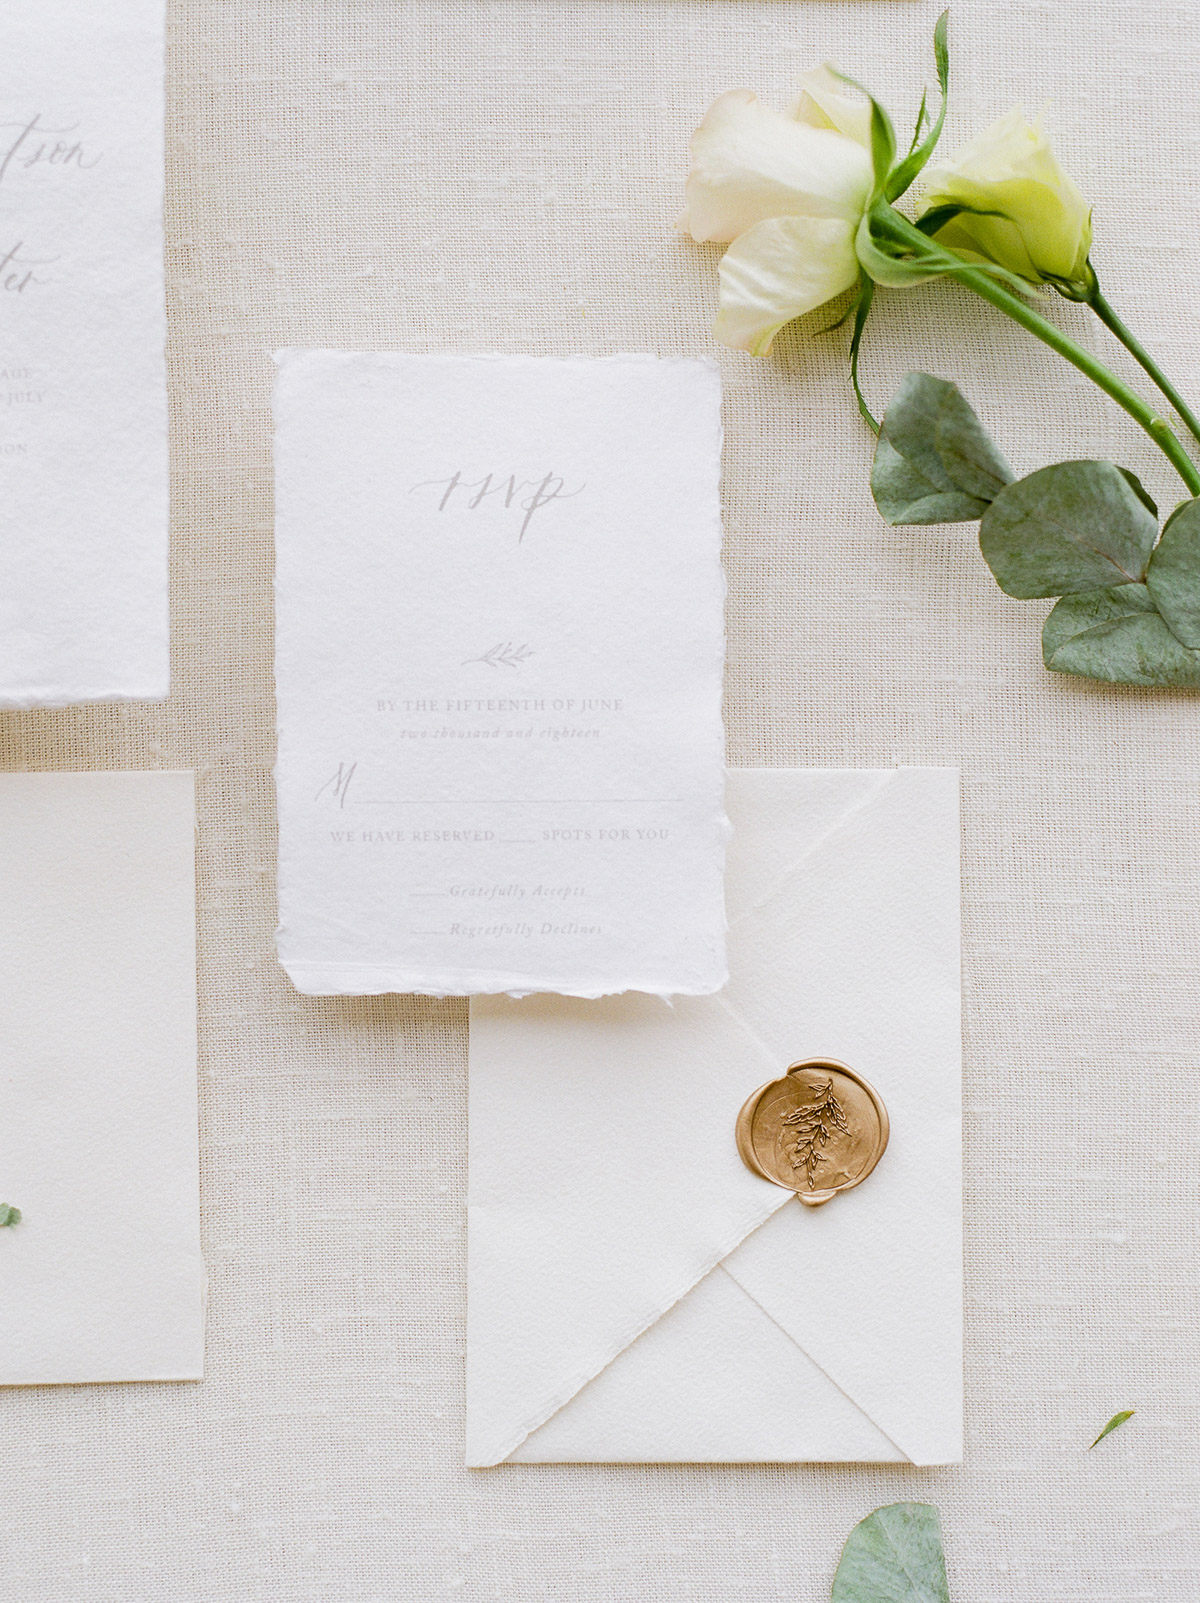 jennifer-xu-photography-vineyard-bride-swish-list-rosewod-eatstes-winery-beamsville-wedding-editorial-28.jpg